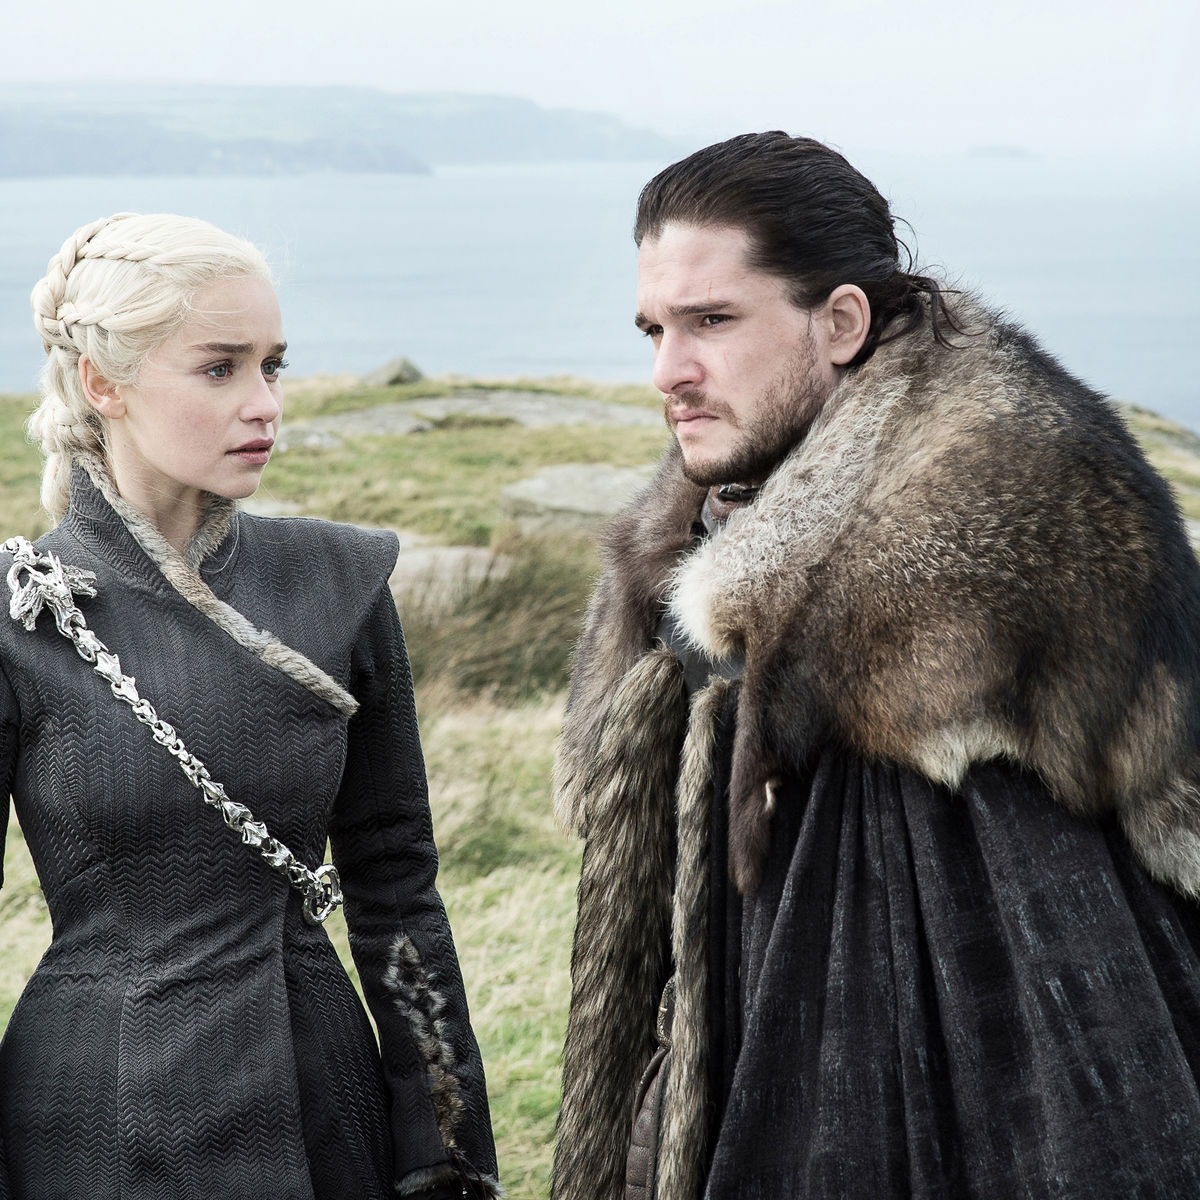 Game-of-Thrones-705-1.jpg